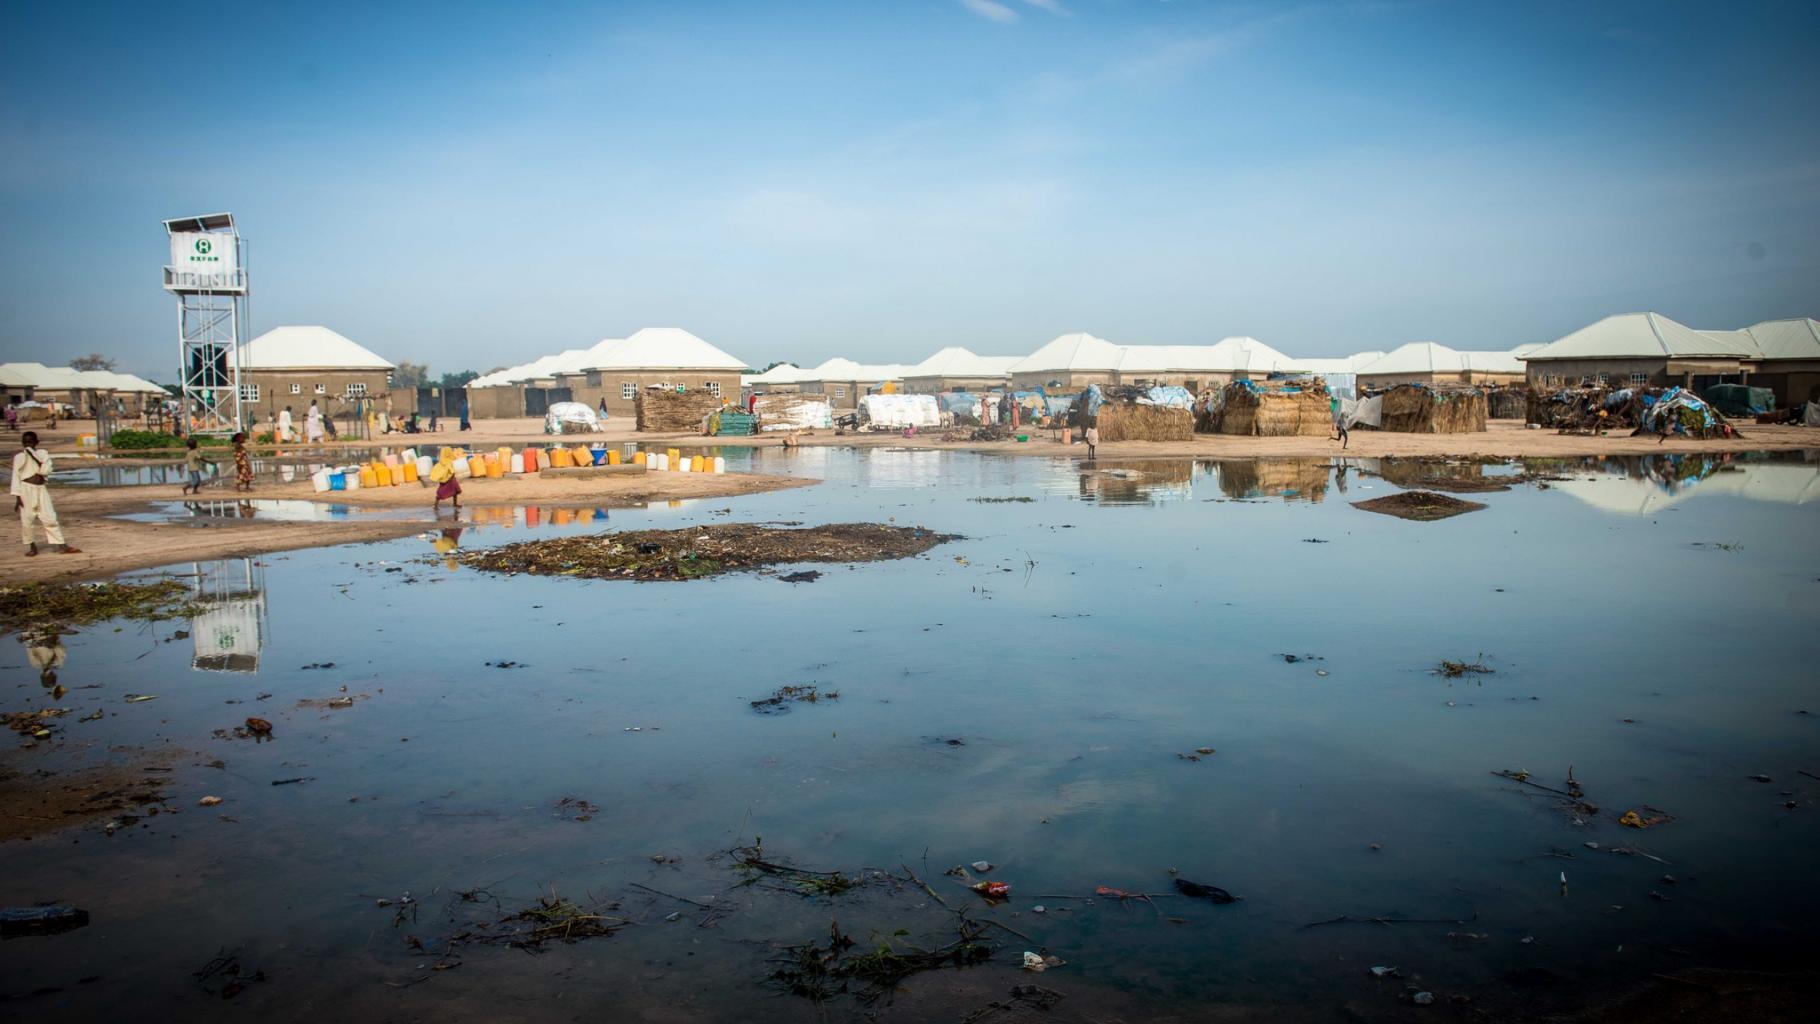 Camp für Binnenflüchtlinge in Maiduguri, Nigeria